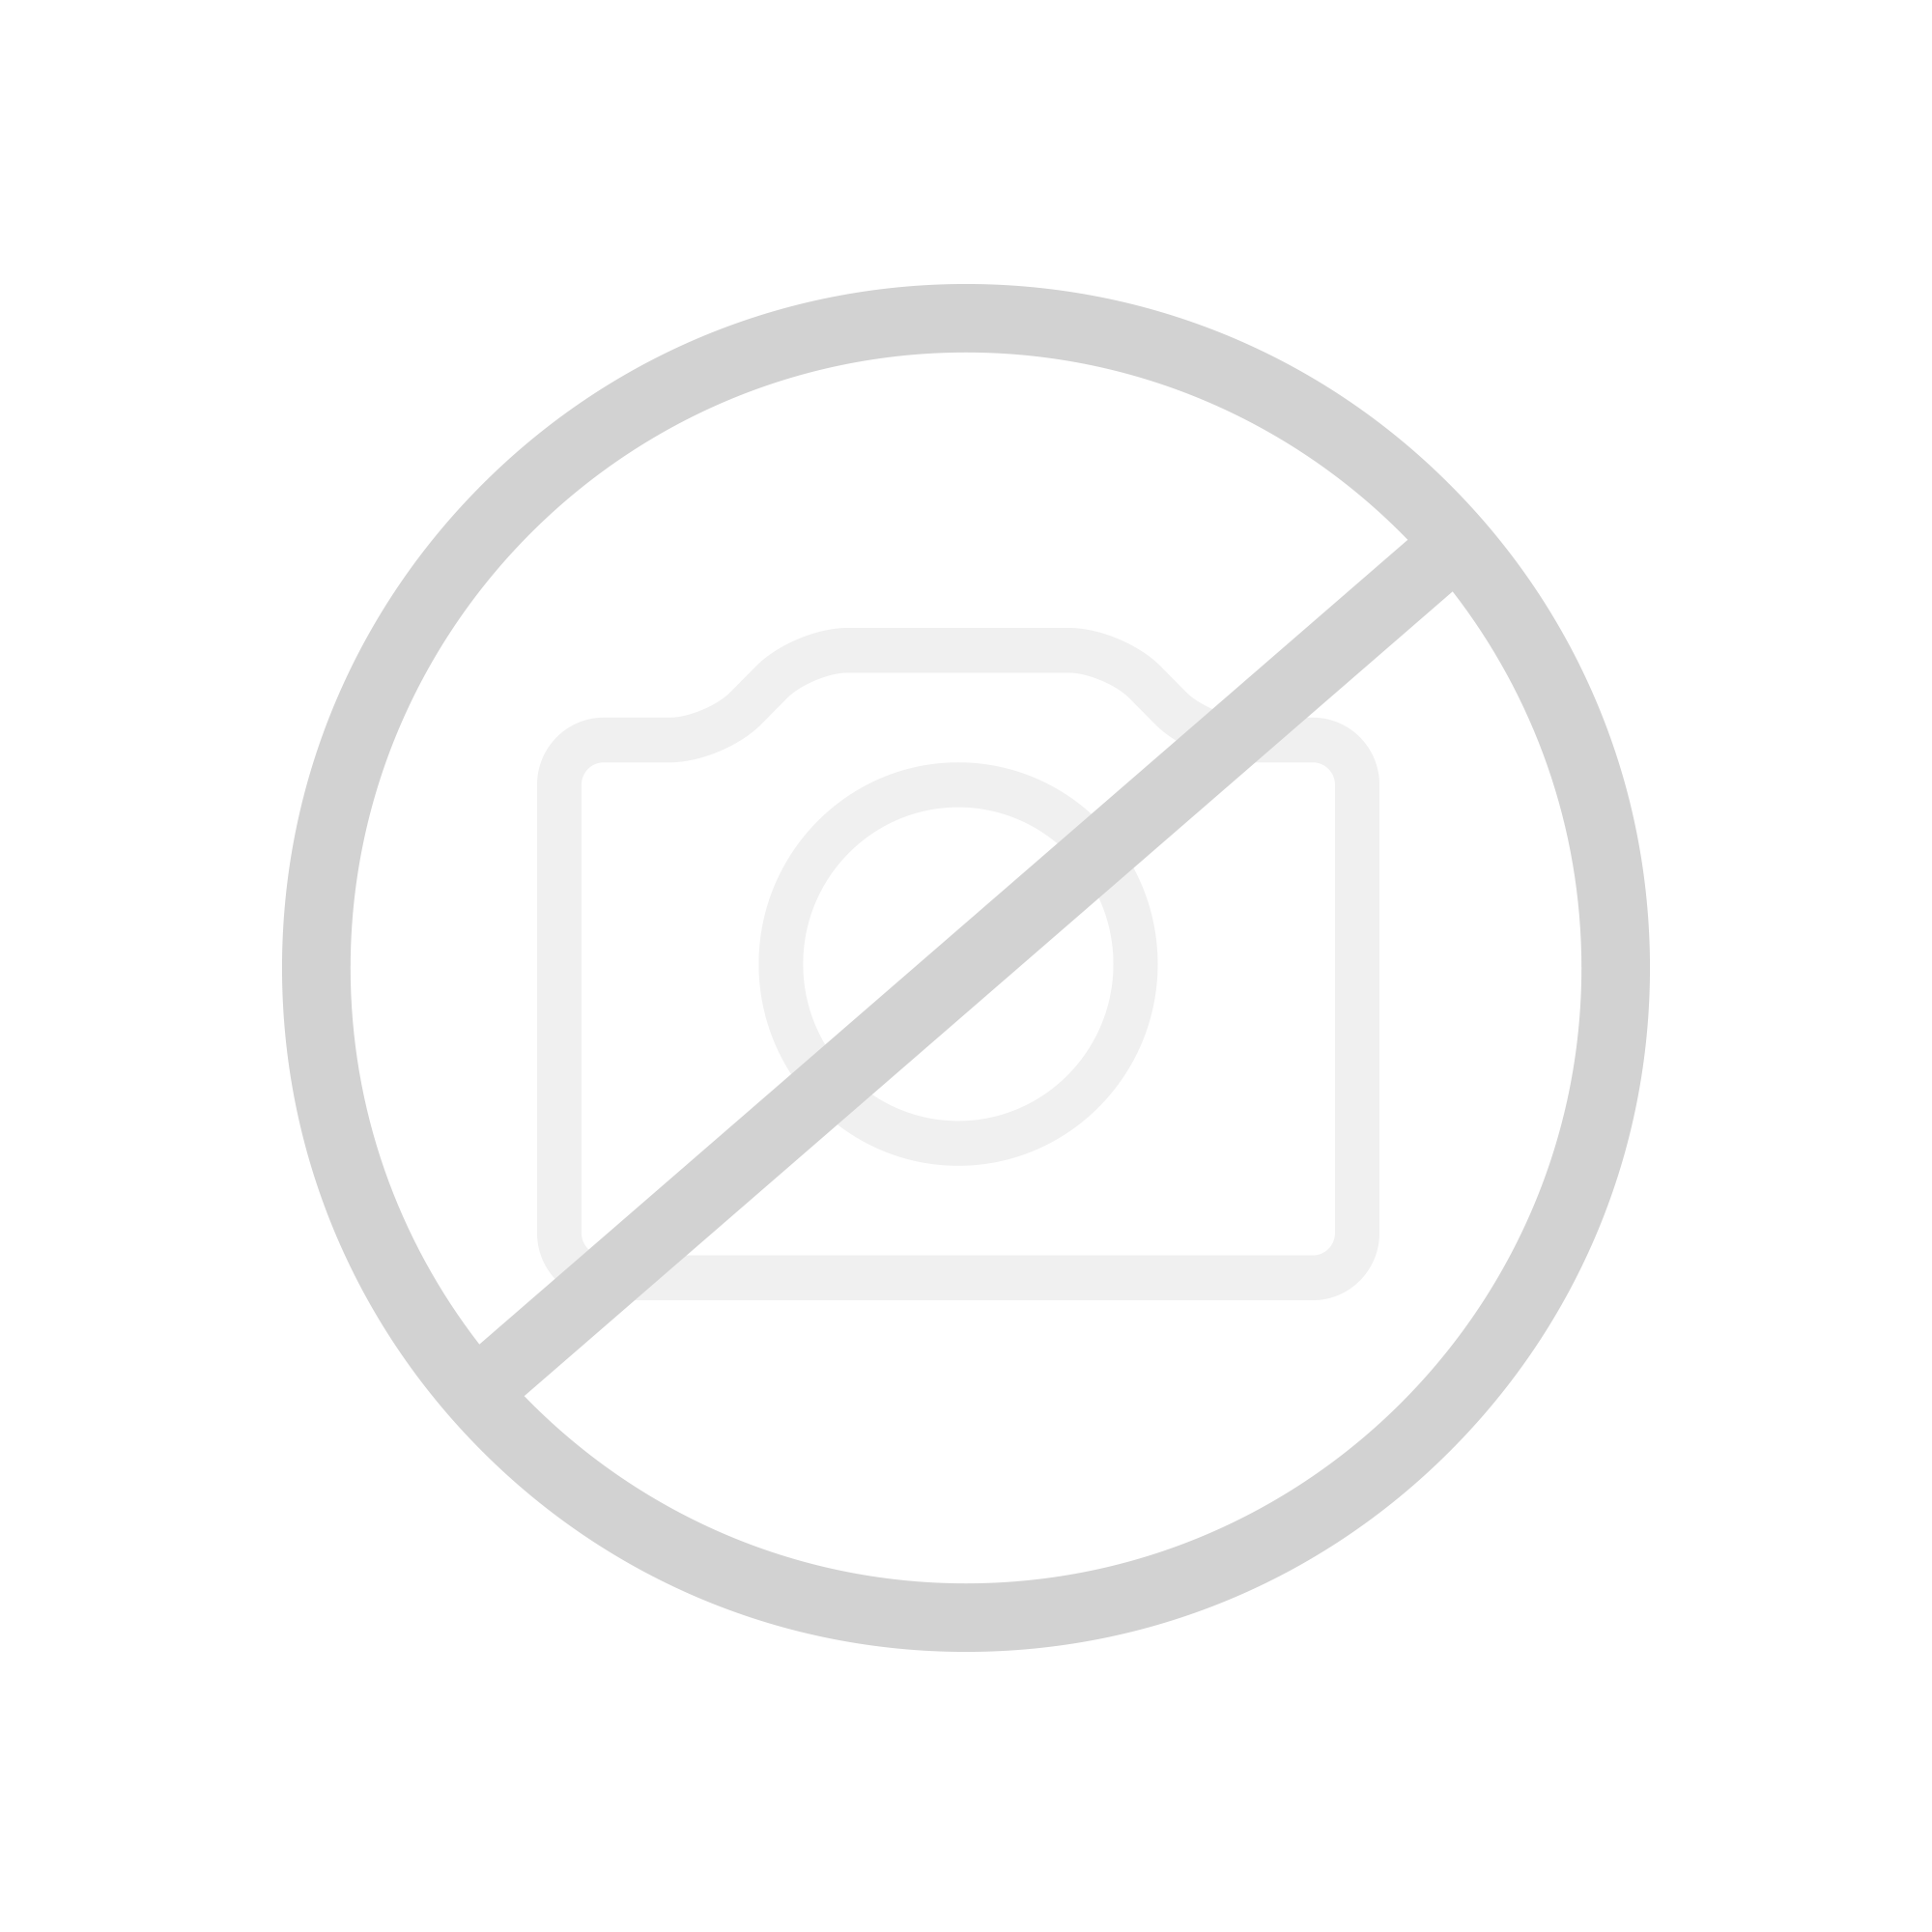 antoniolupi PLAY72 Handtuchstange B: 720 mm